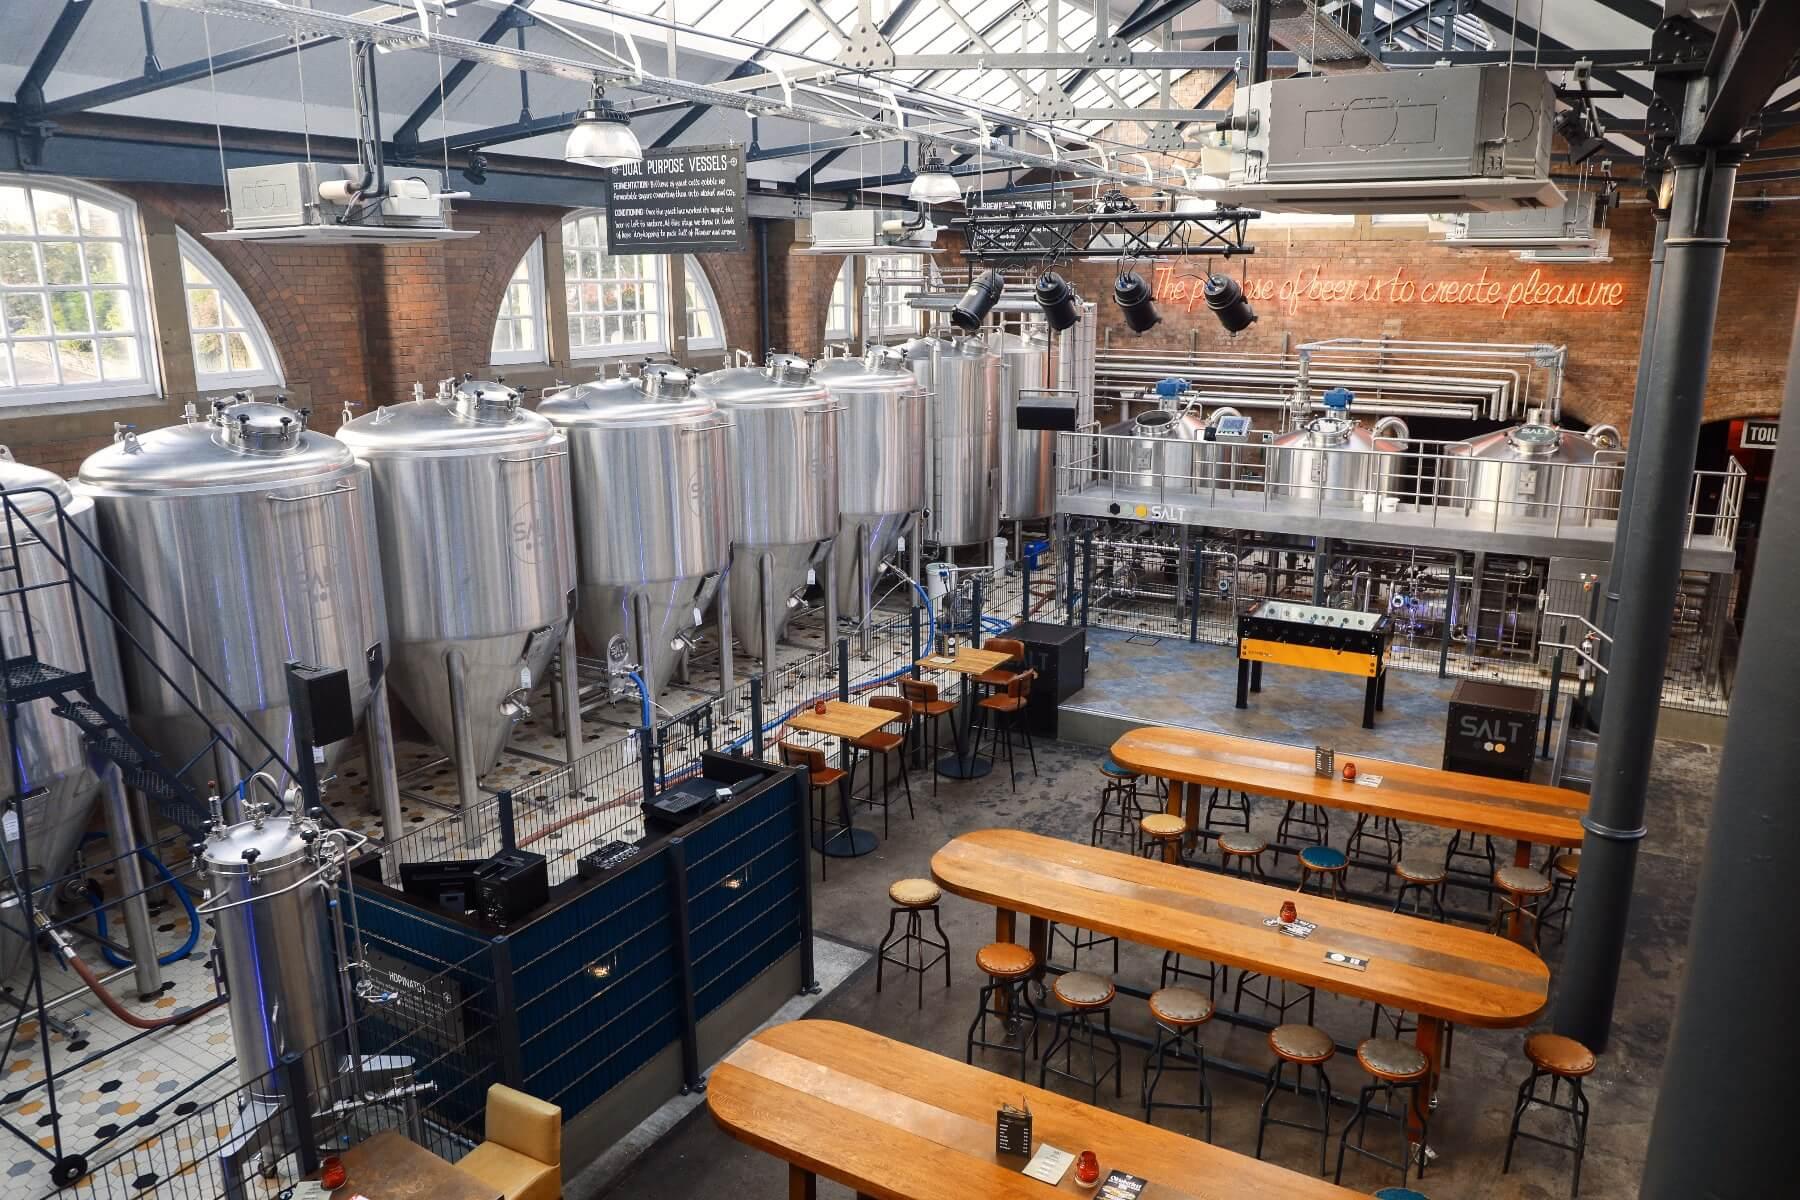 Salt brewery